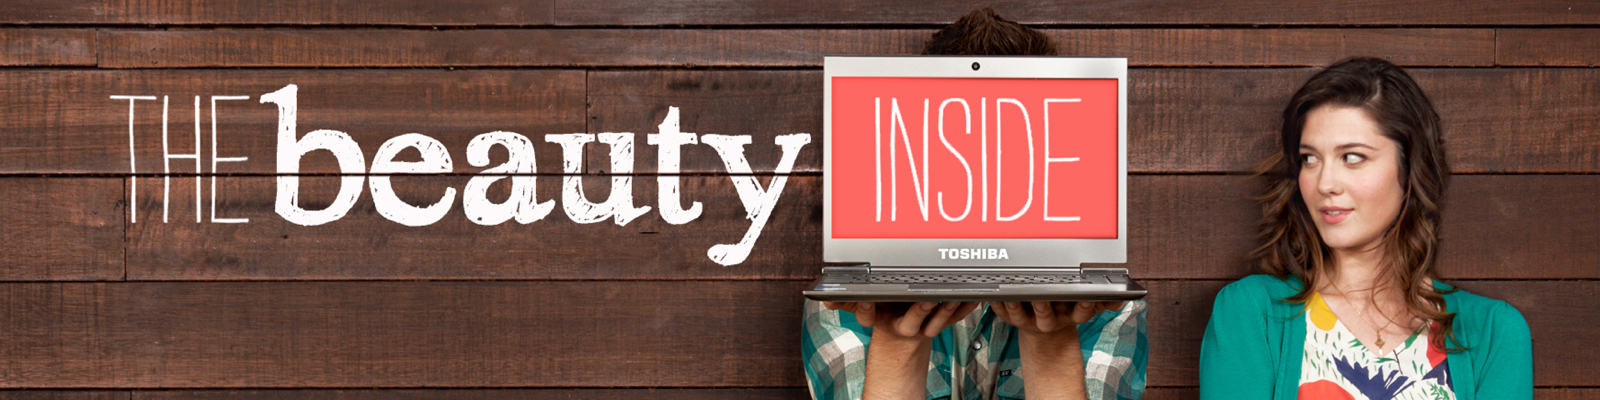 The Beauty Inside - banner